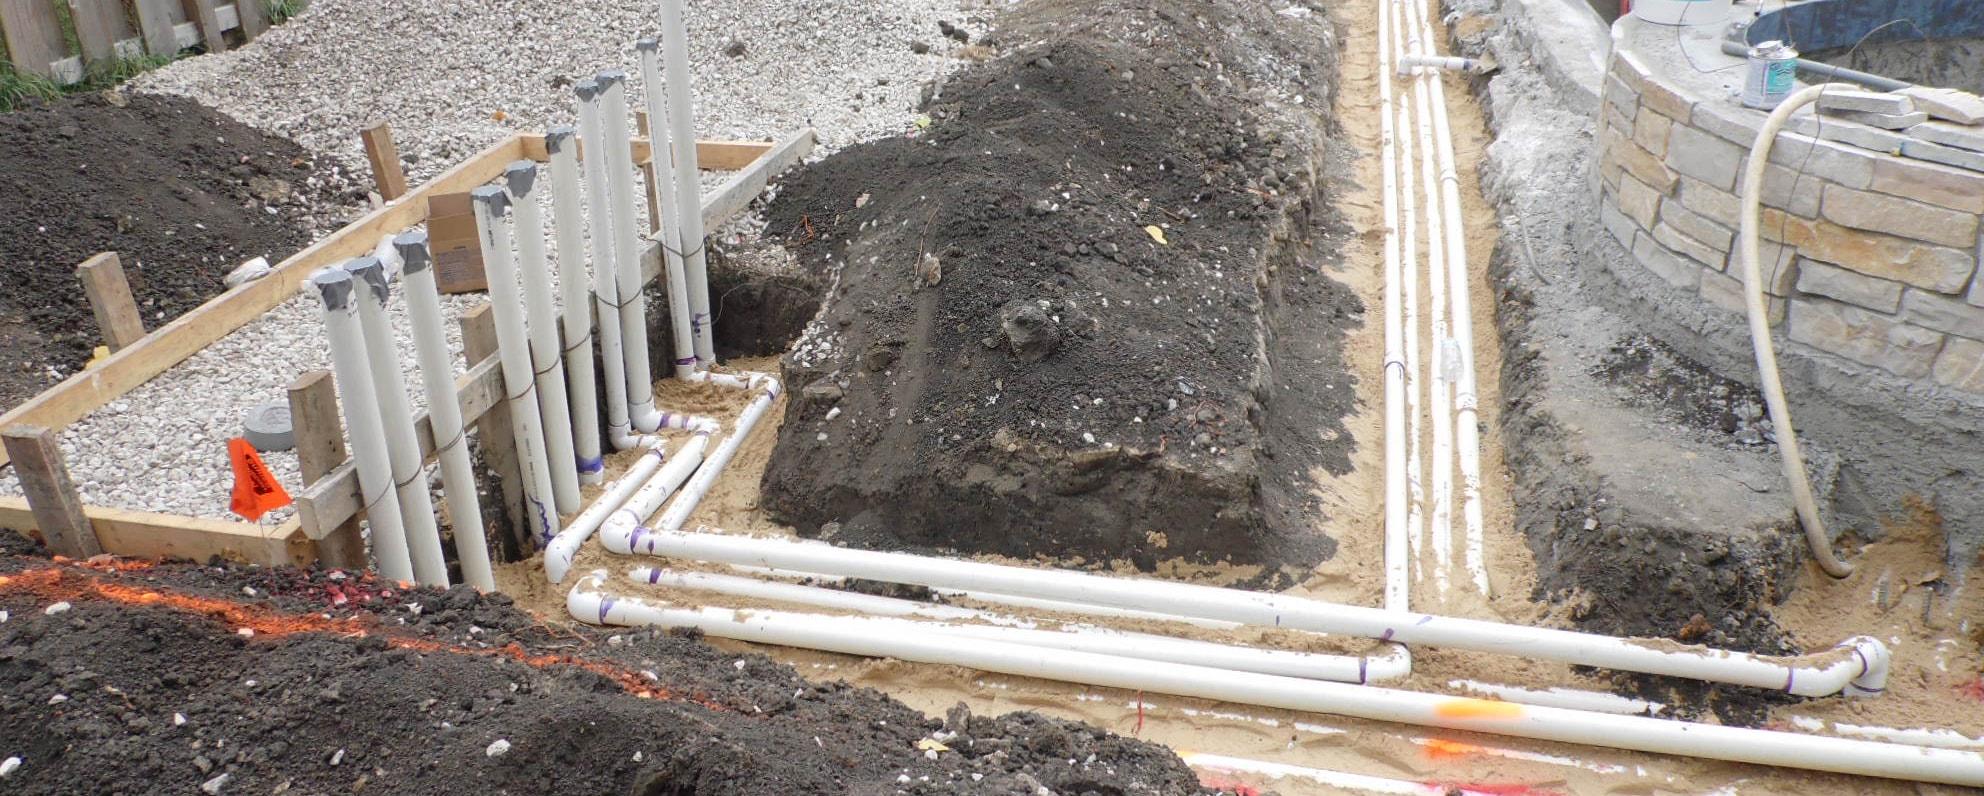 Swimming Pool Plumbing and Electrical  Danna Pools Inc